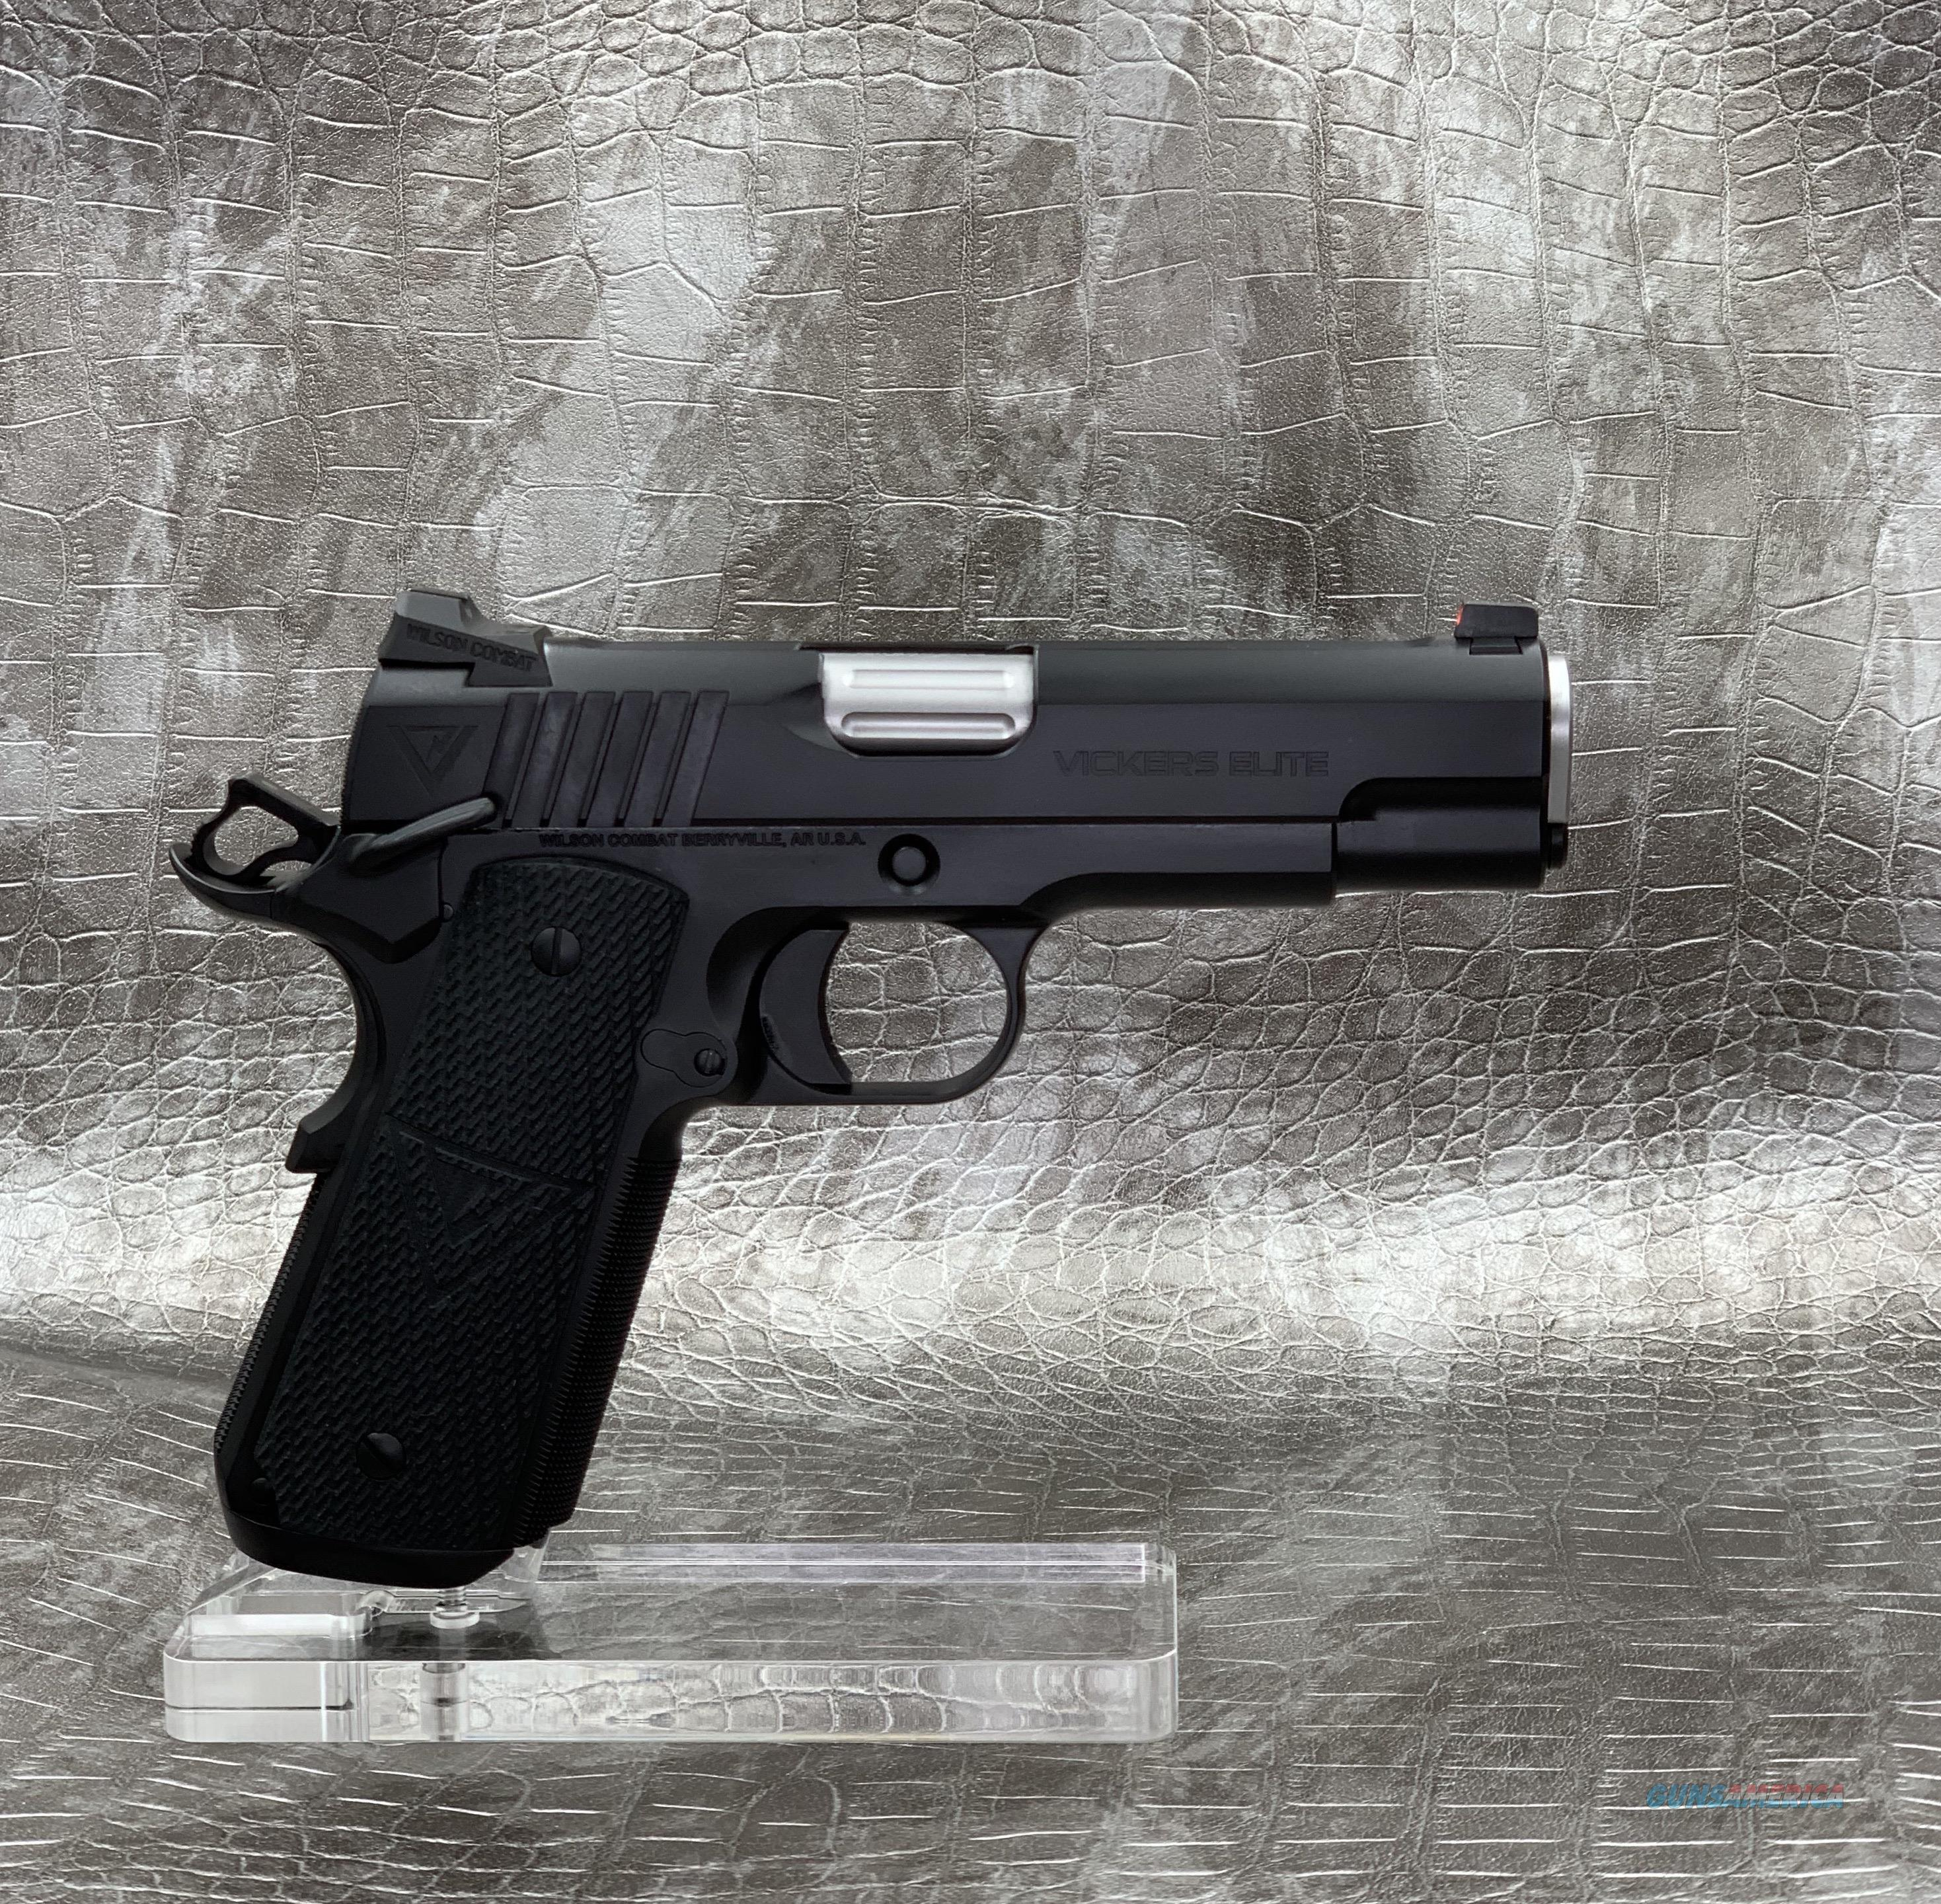 Wilson Combat Vicker's Elite Commander 9MM - Black Armor Tuff  Guns > Pistols > Wilson Combat Pistols